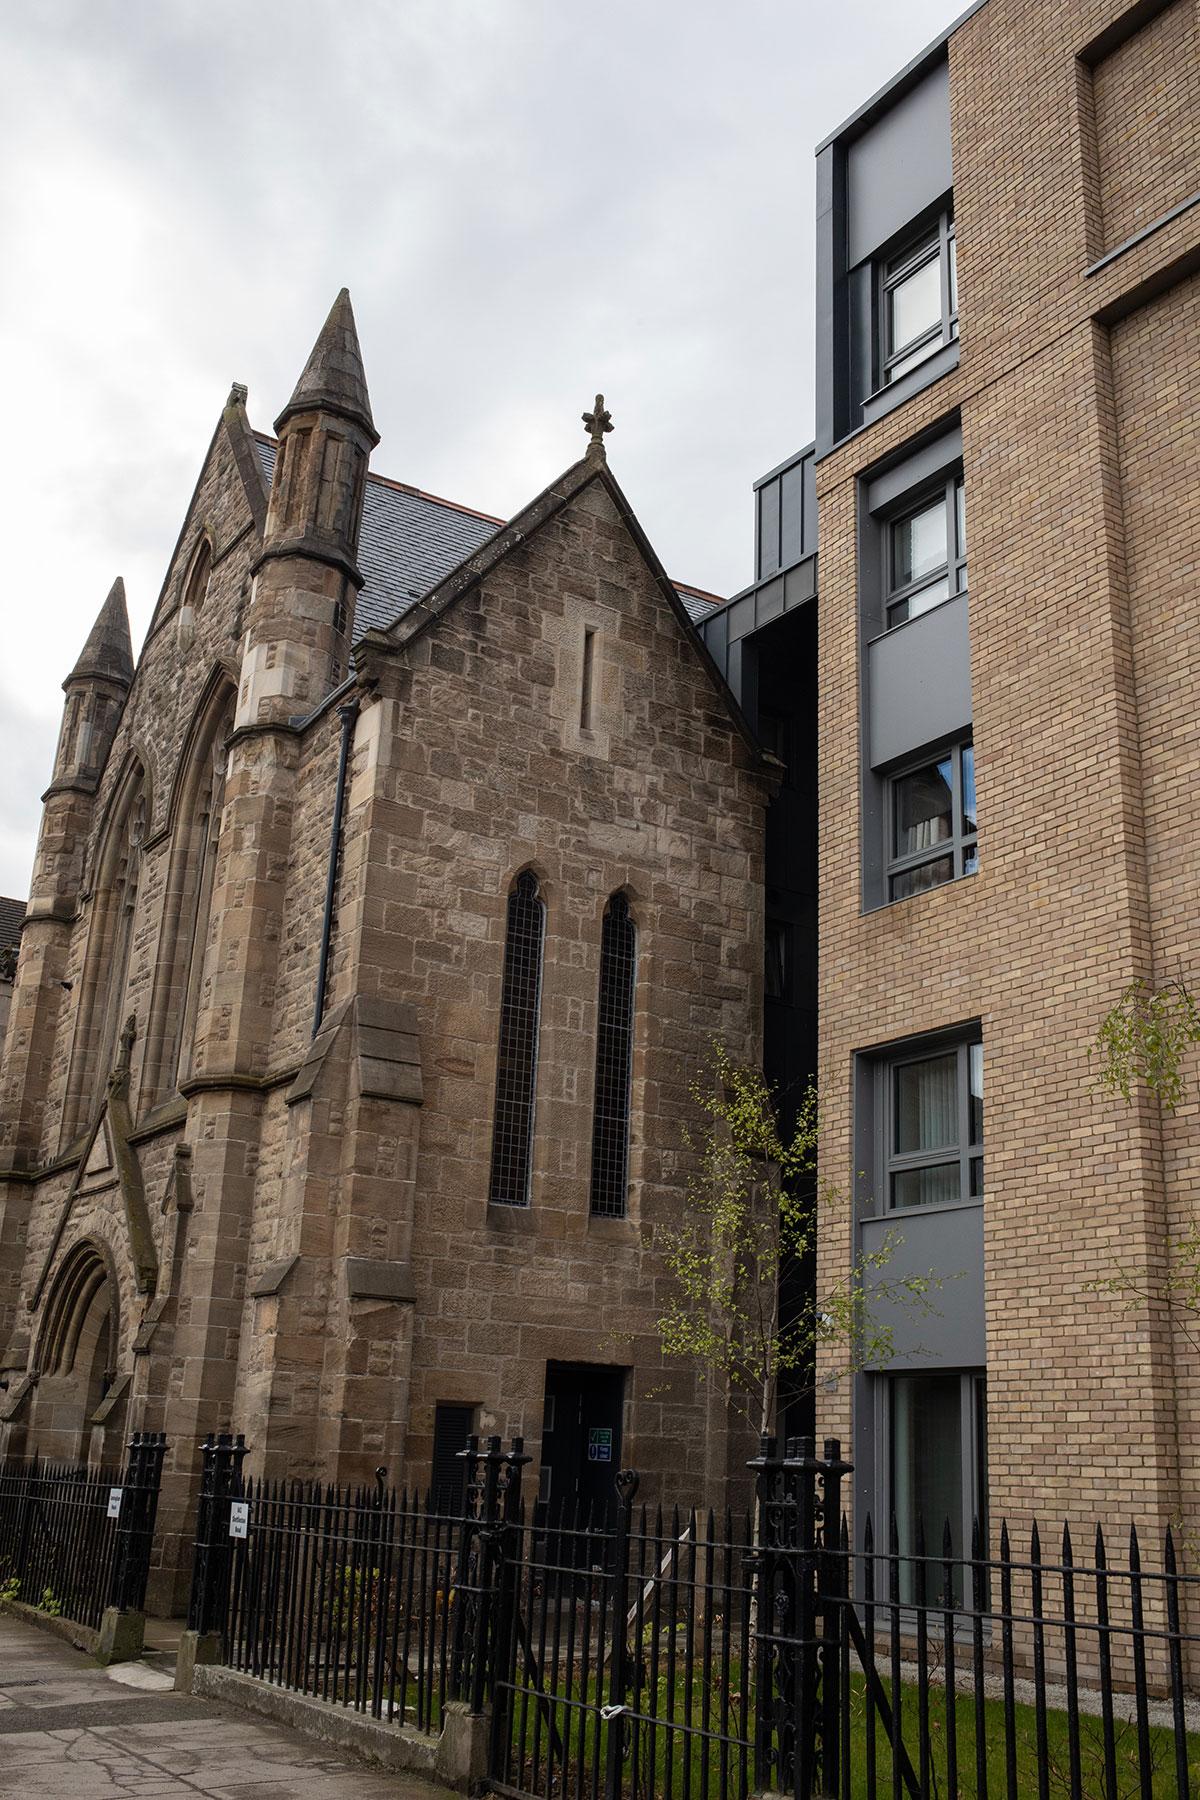 Carntyne Old Church, where Colin Thomson lives